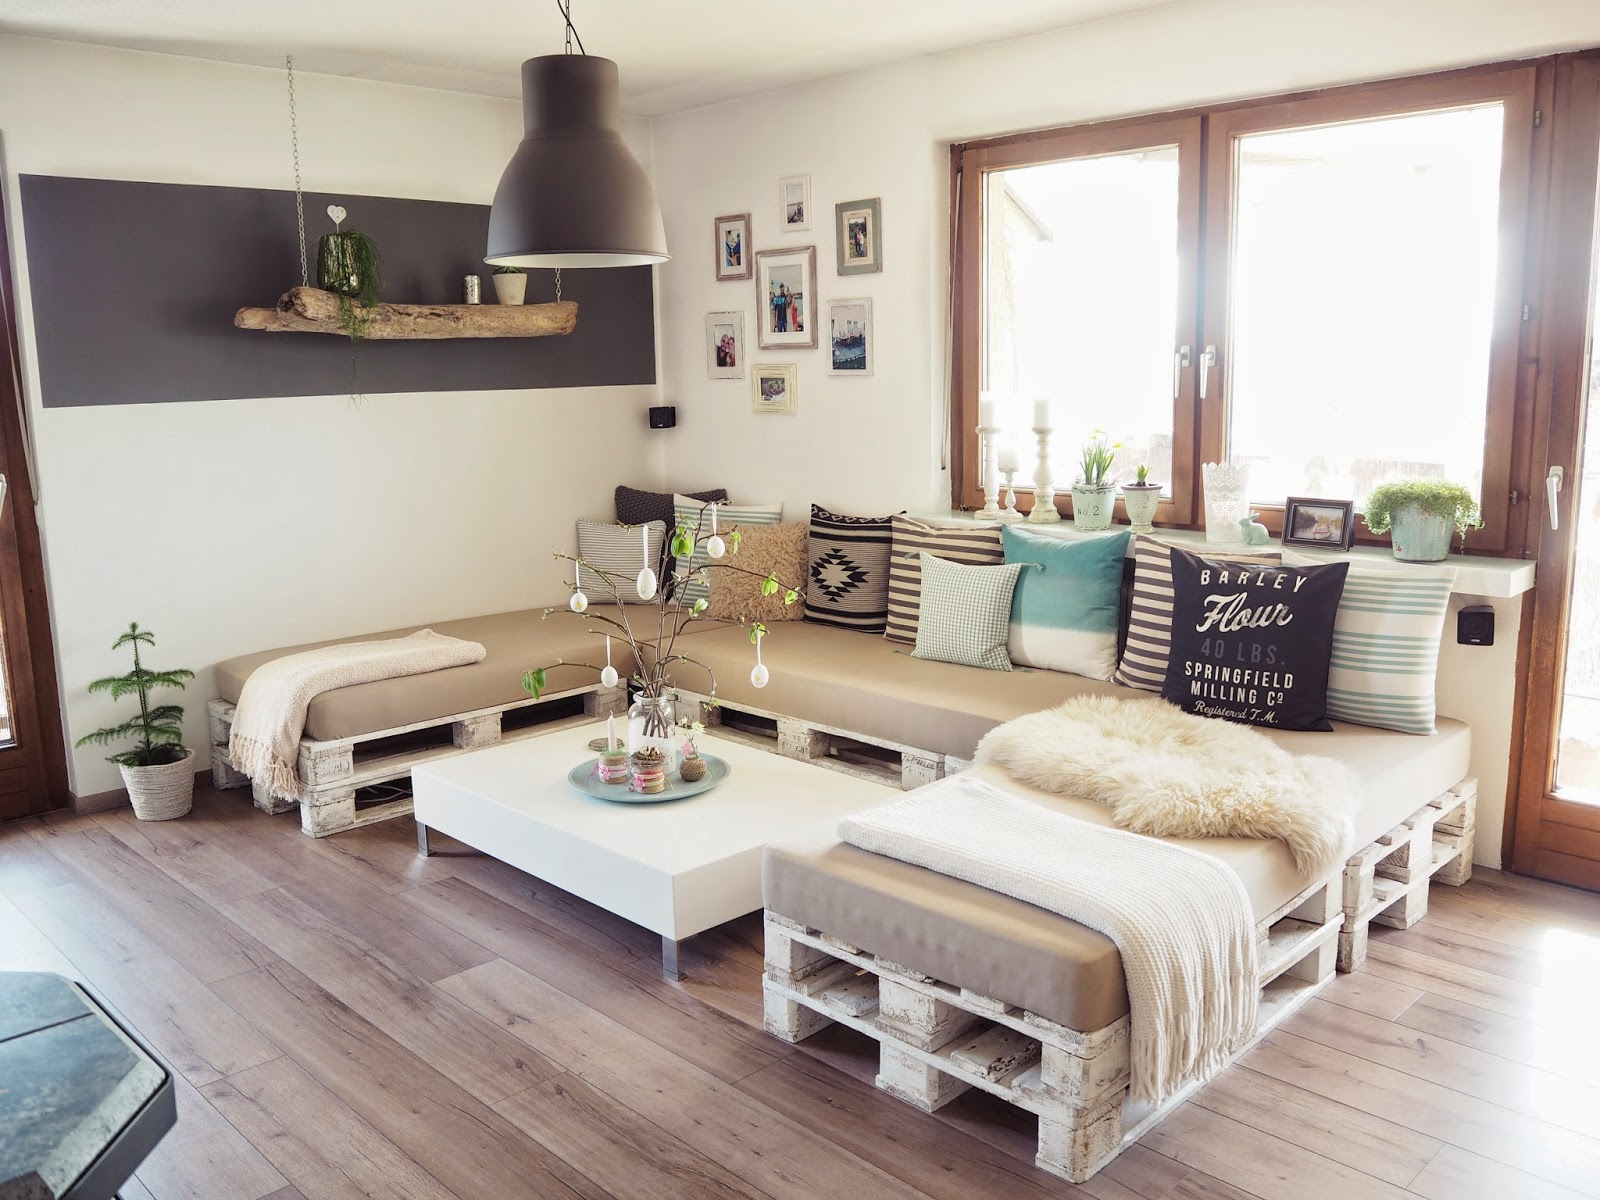 Comfy Diy Pallet Sofa Ideas That Look Surprisingly Stylish